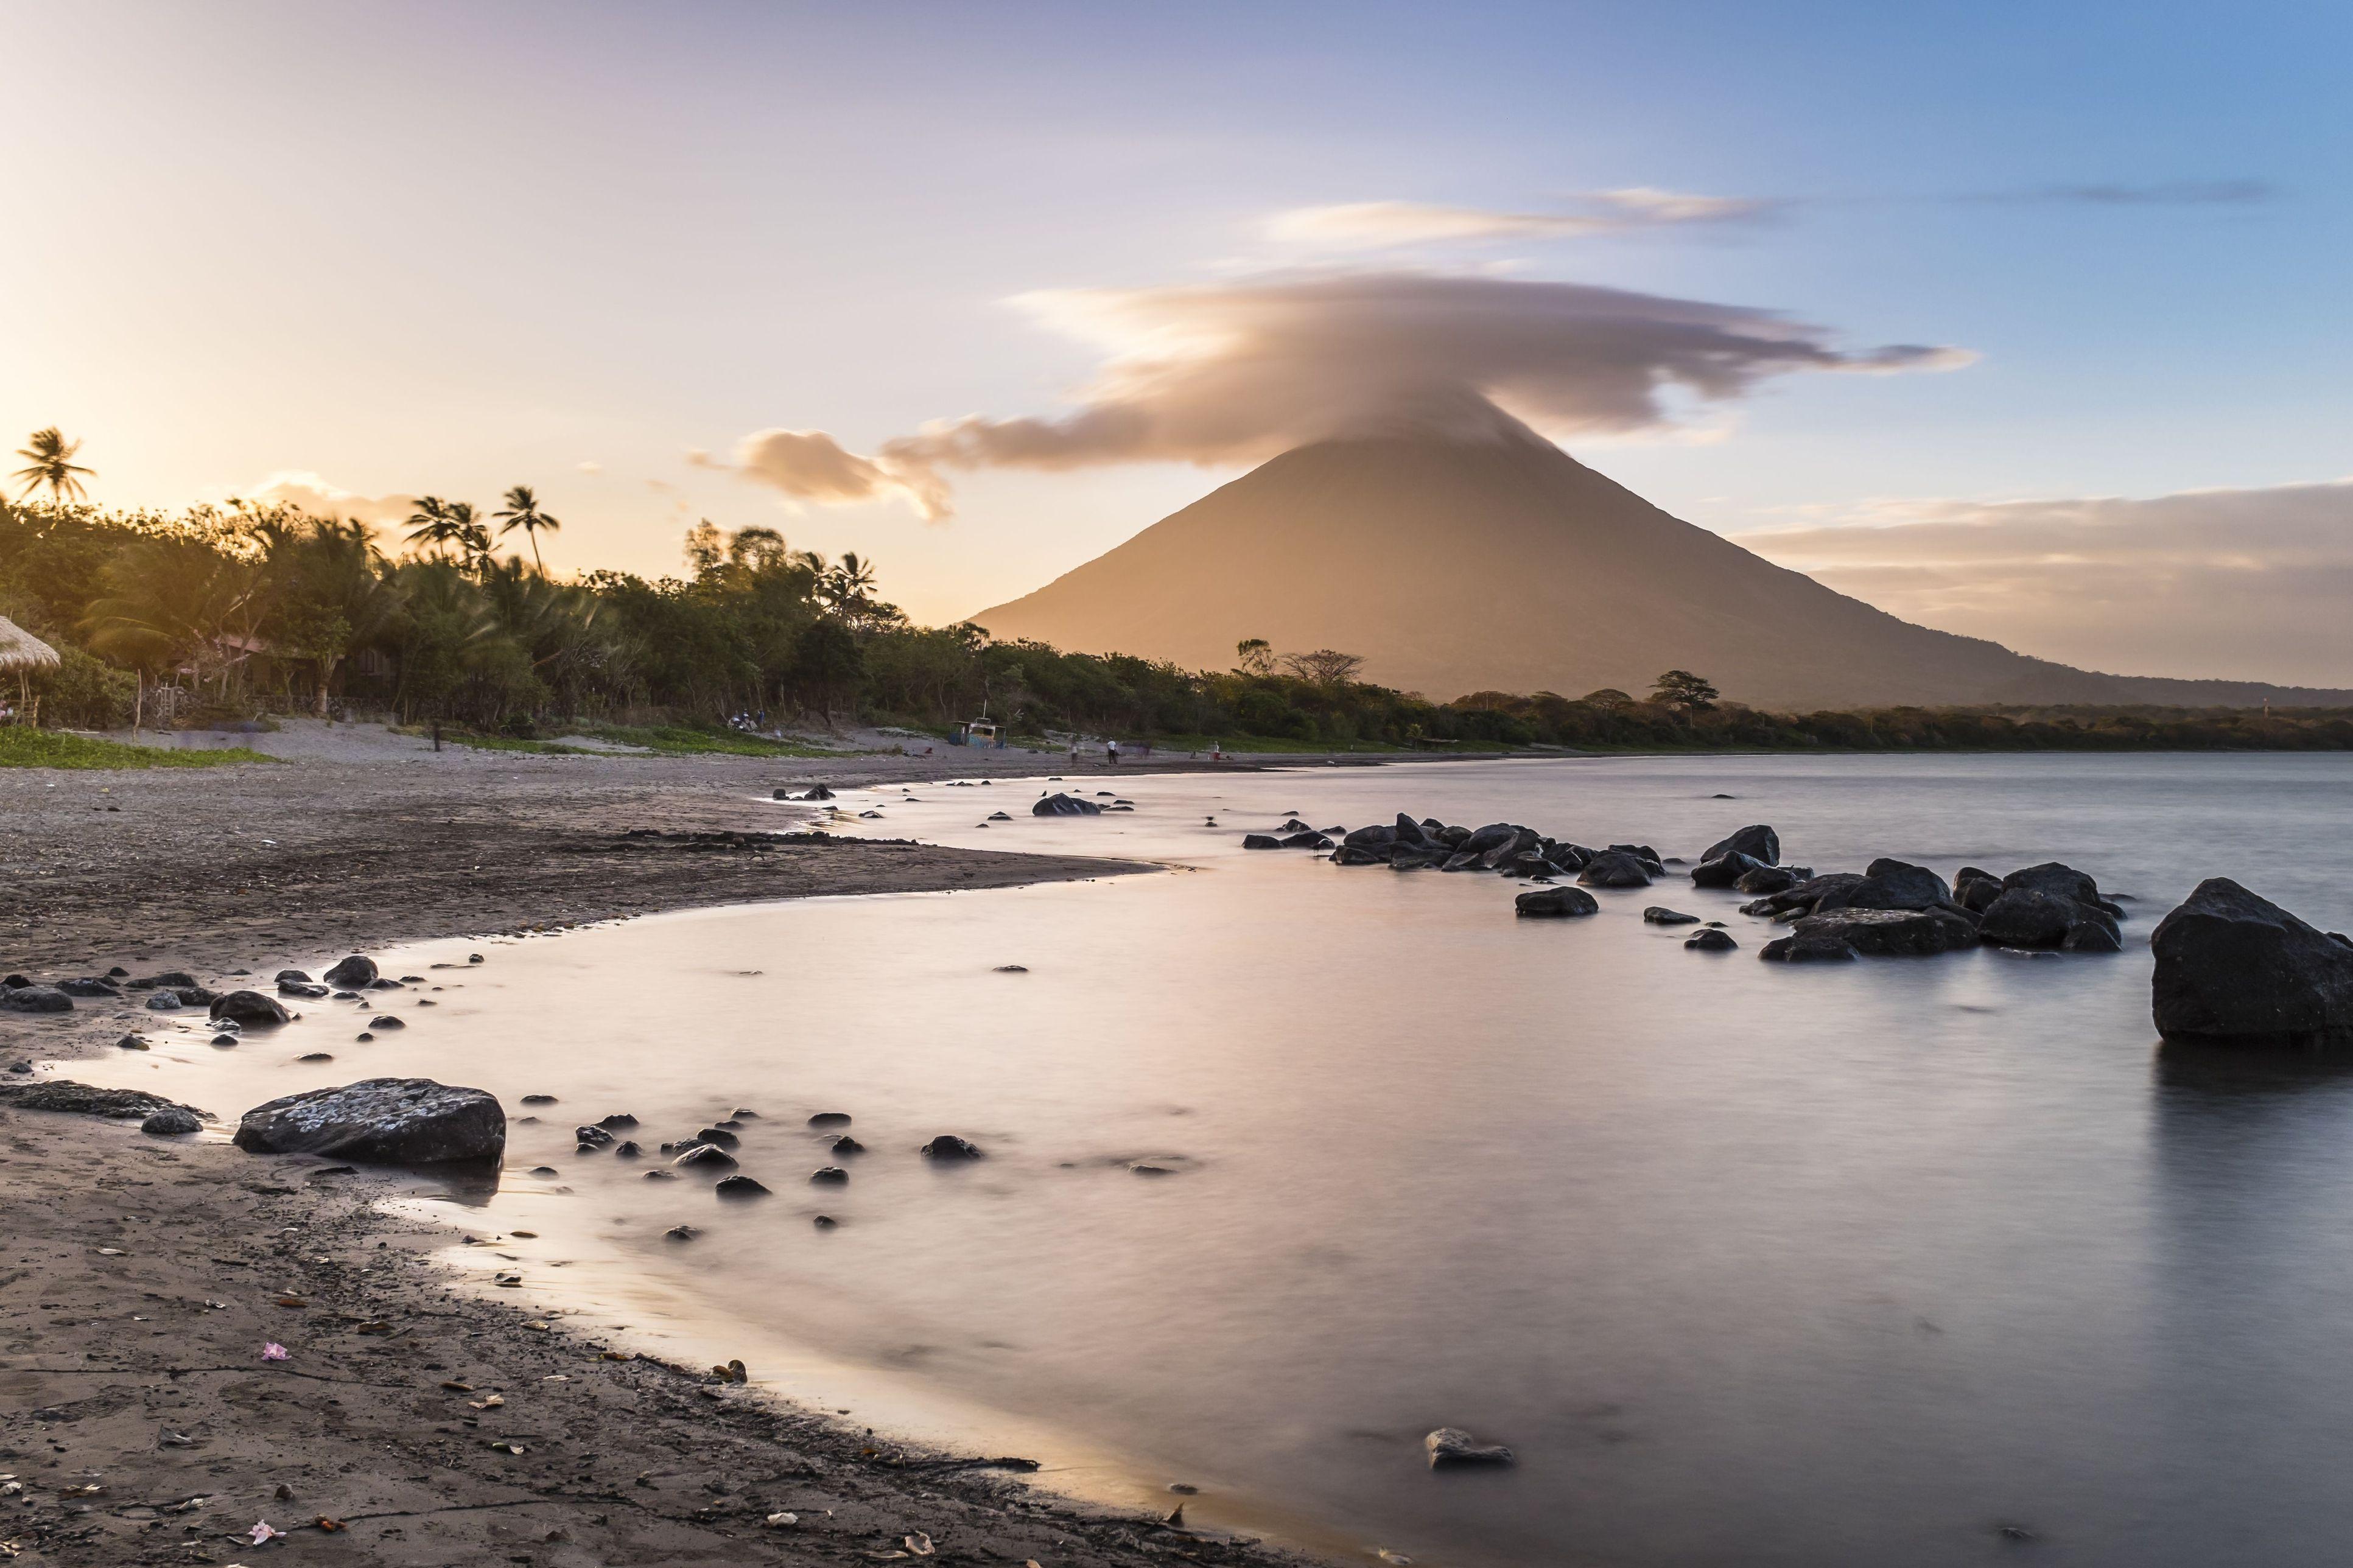 Nicaragua, Rivas department, Ometepe island, the shore of lake Nicaragua (lake Cocibolca), Santo Domingo beach and volcano Concepcion